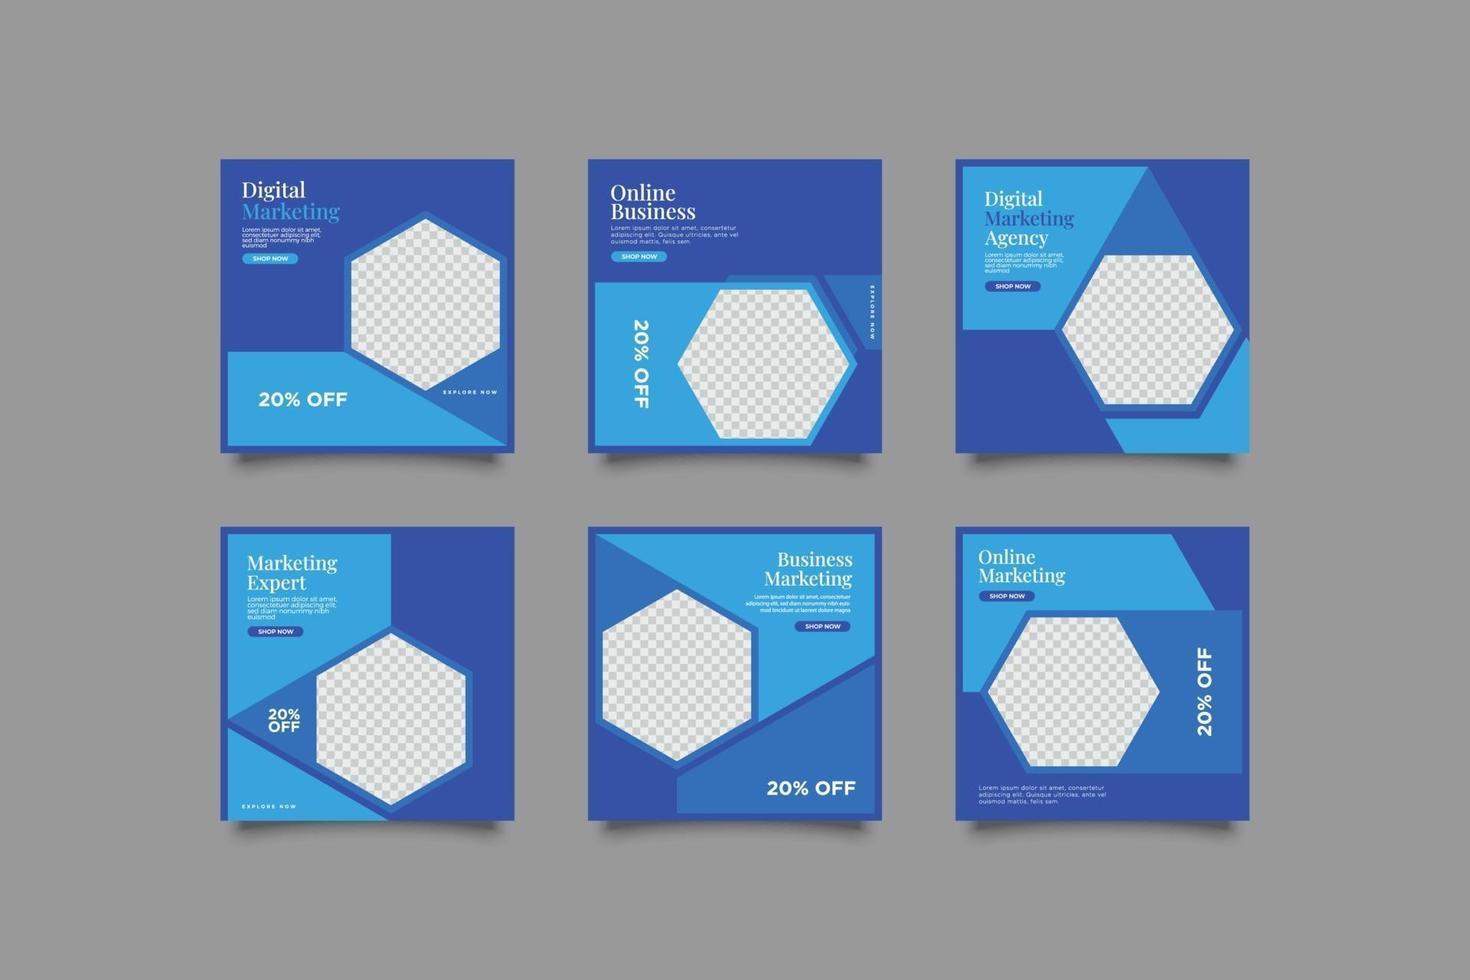 minimalistische moderne blauwe sociale media postbundel vector